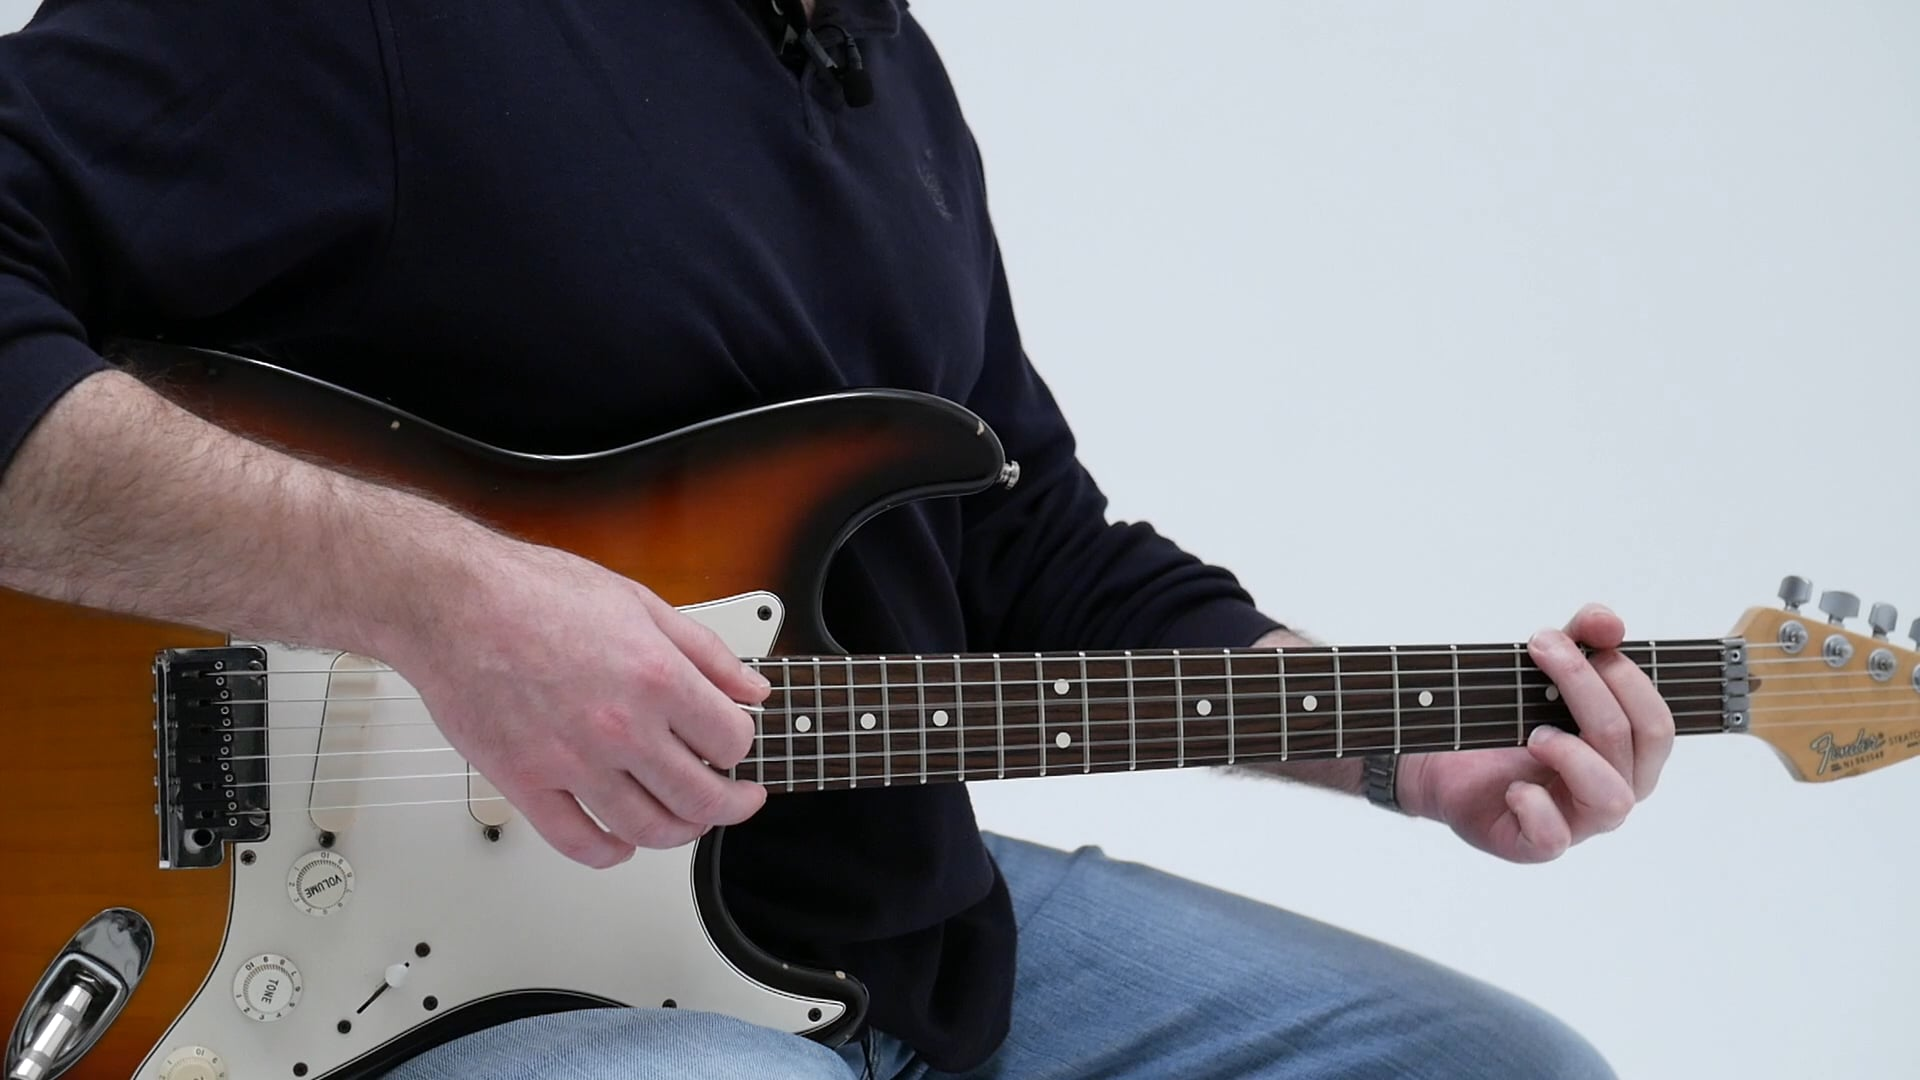 Common Chord Progression 15 The 50s Or Doo Wop Progression